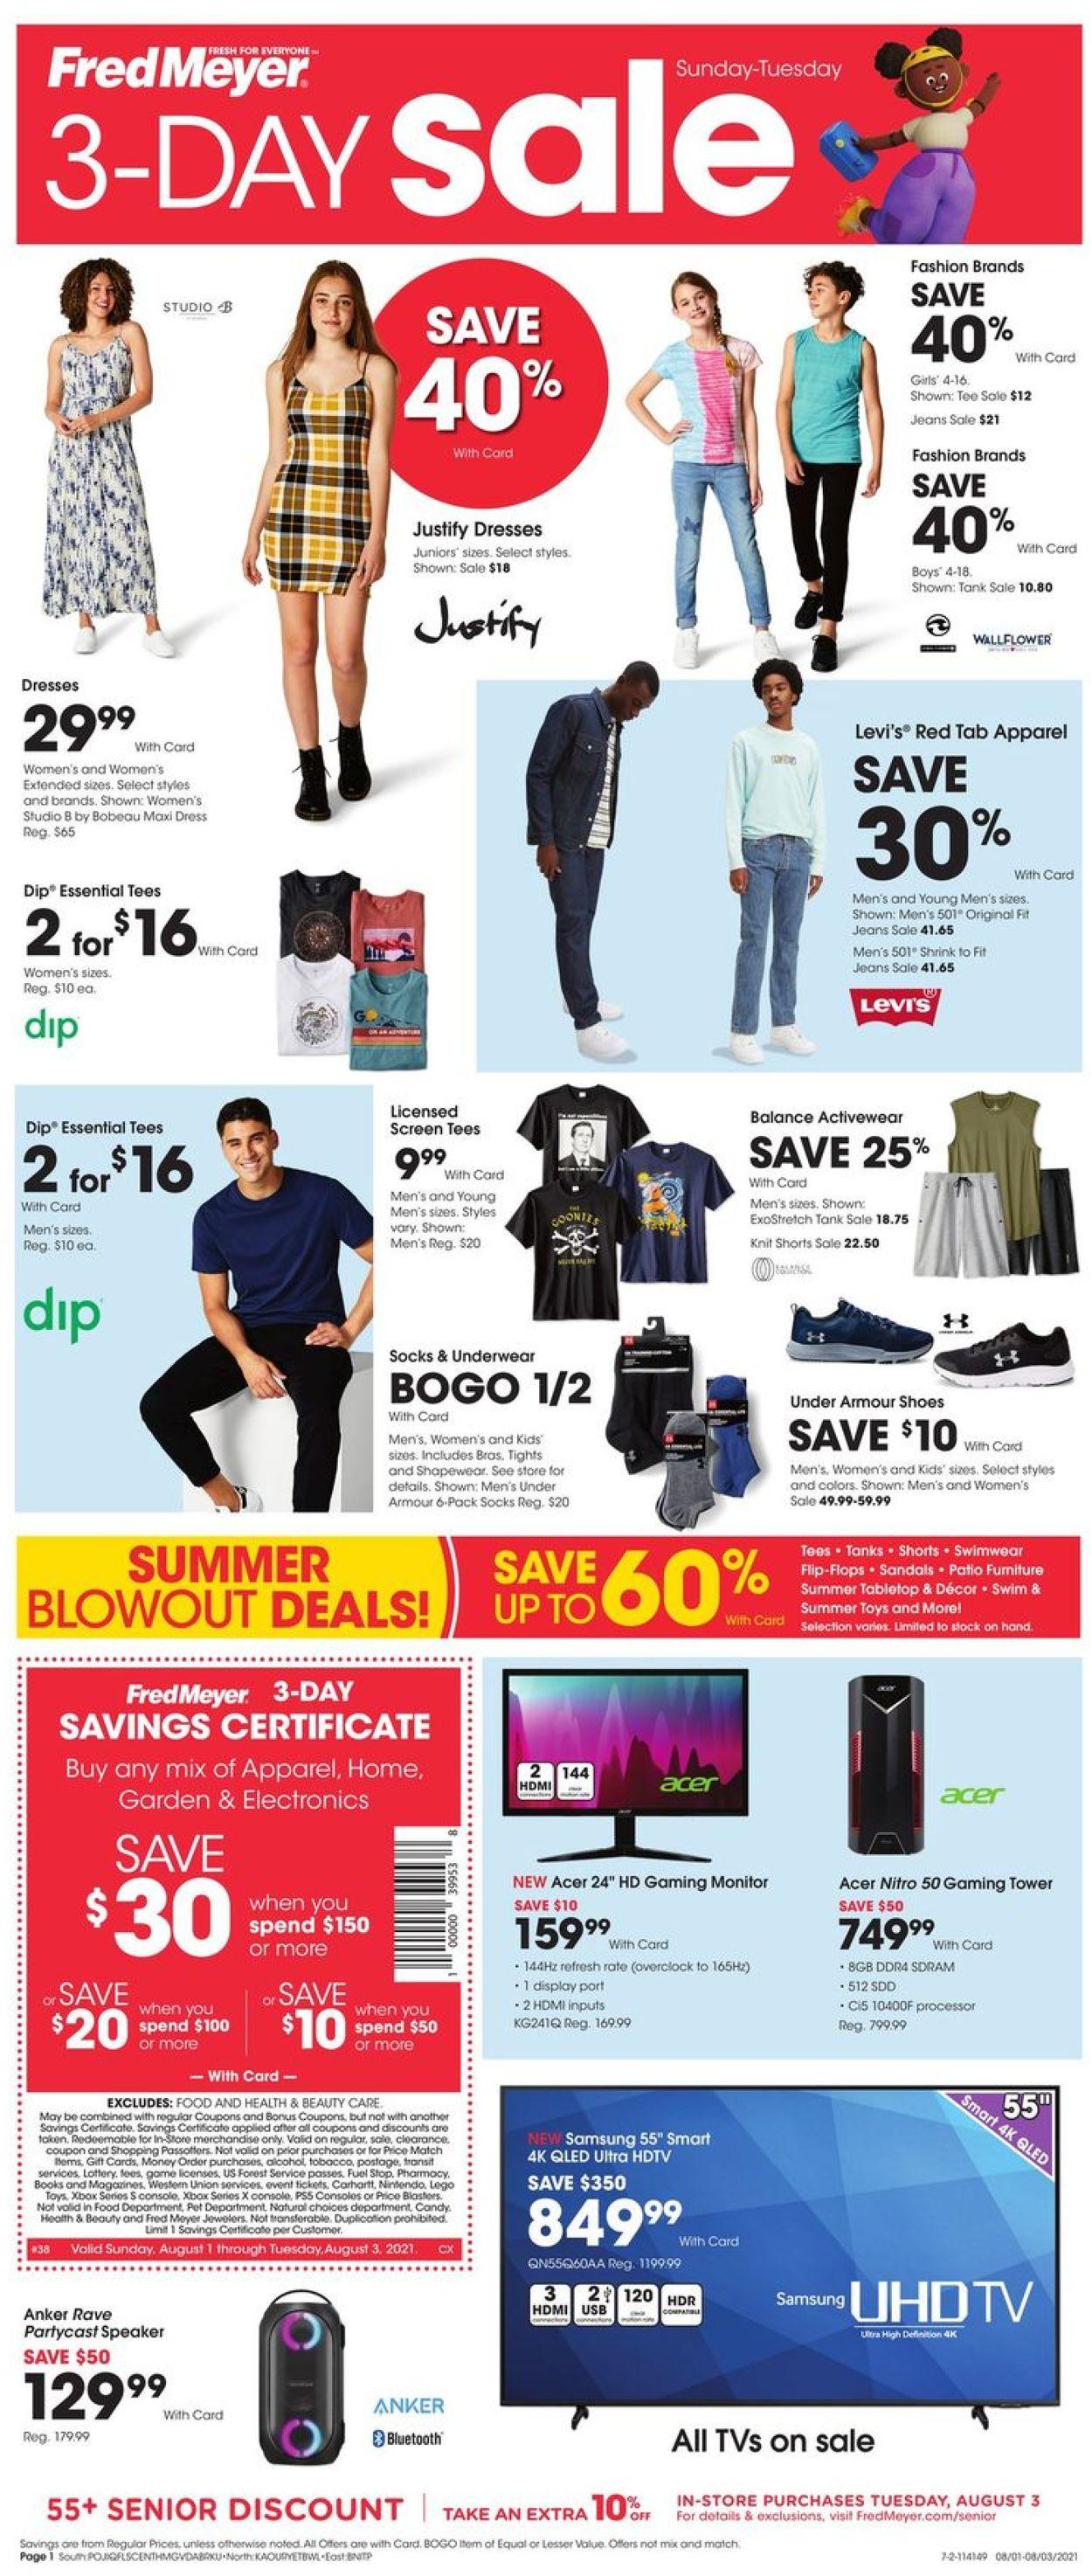 Fred Meyer Weekly Ad Circular - valid 08/01-08/03/2021